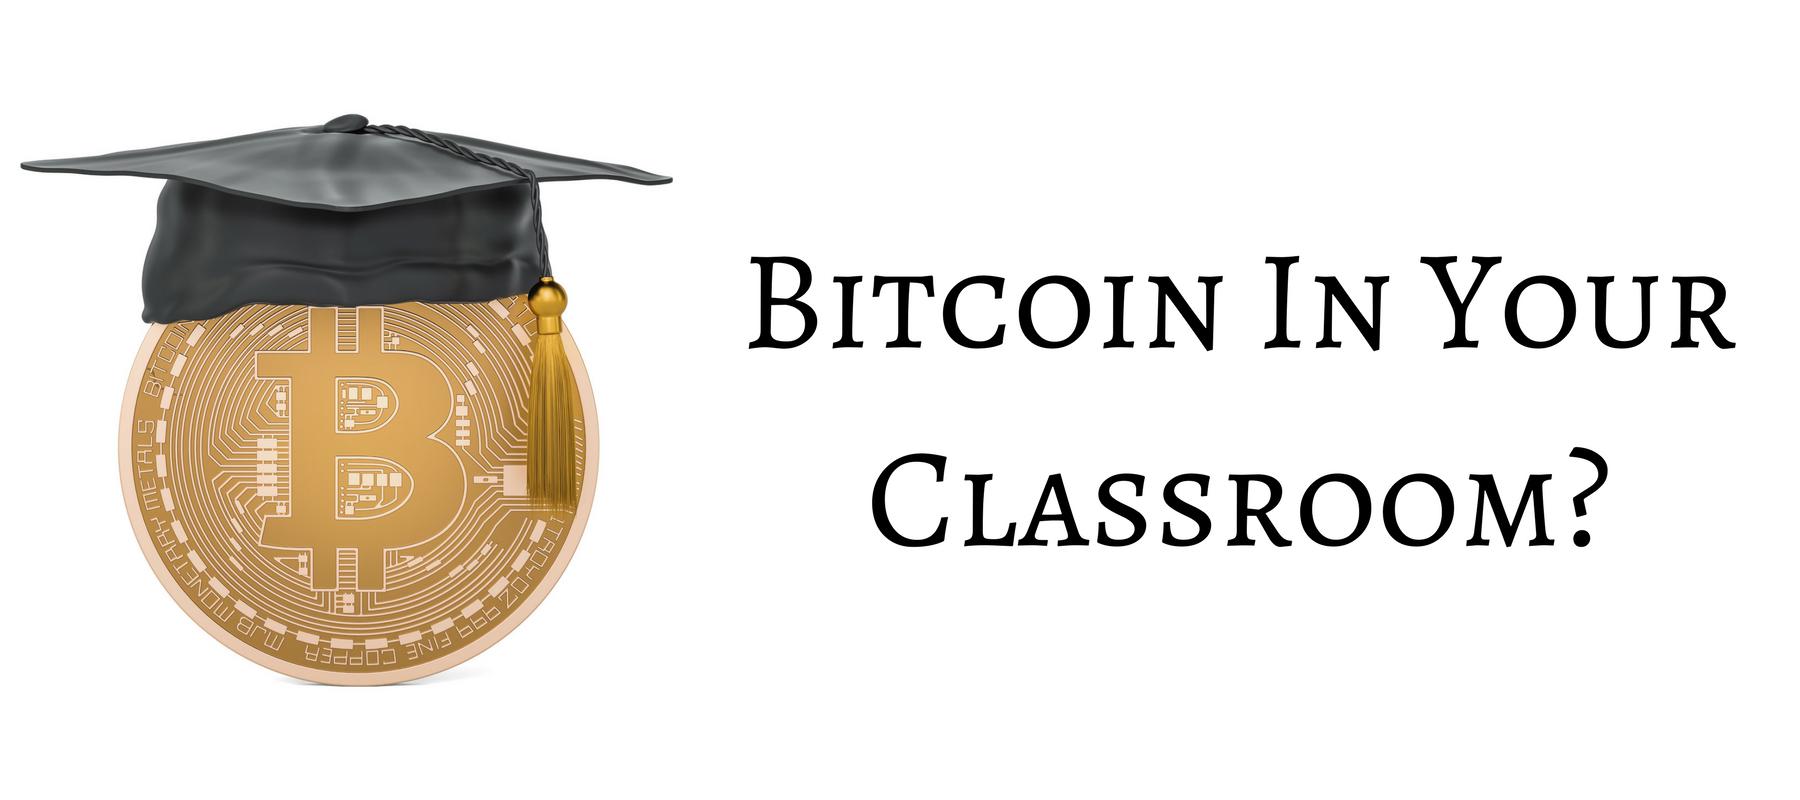 Bitcoin in the classroom